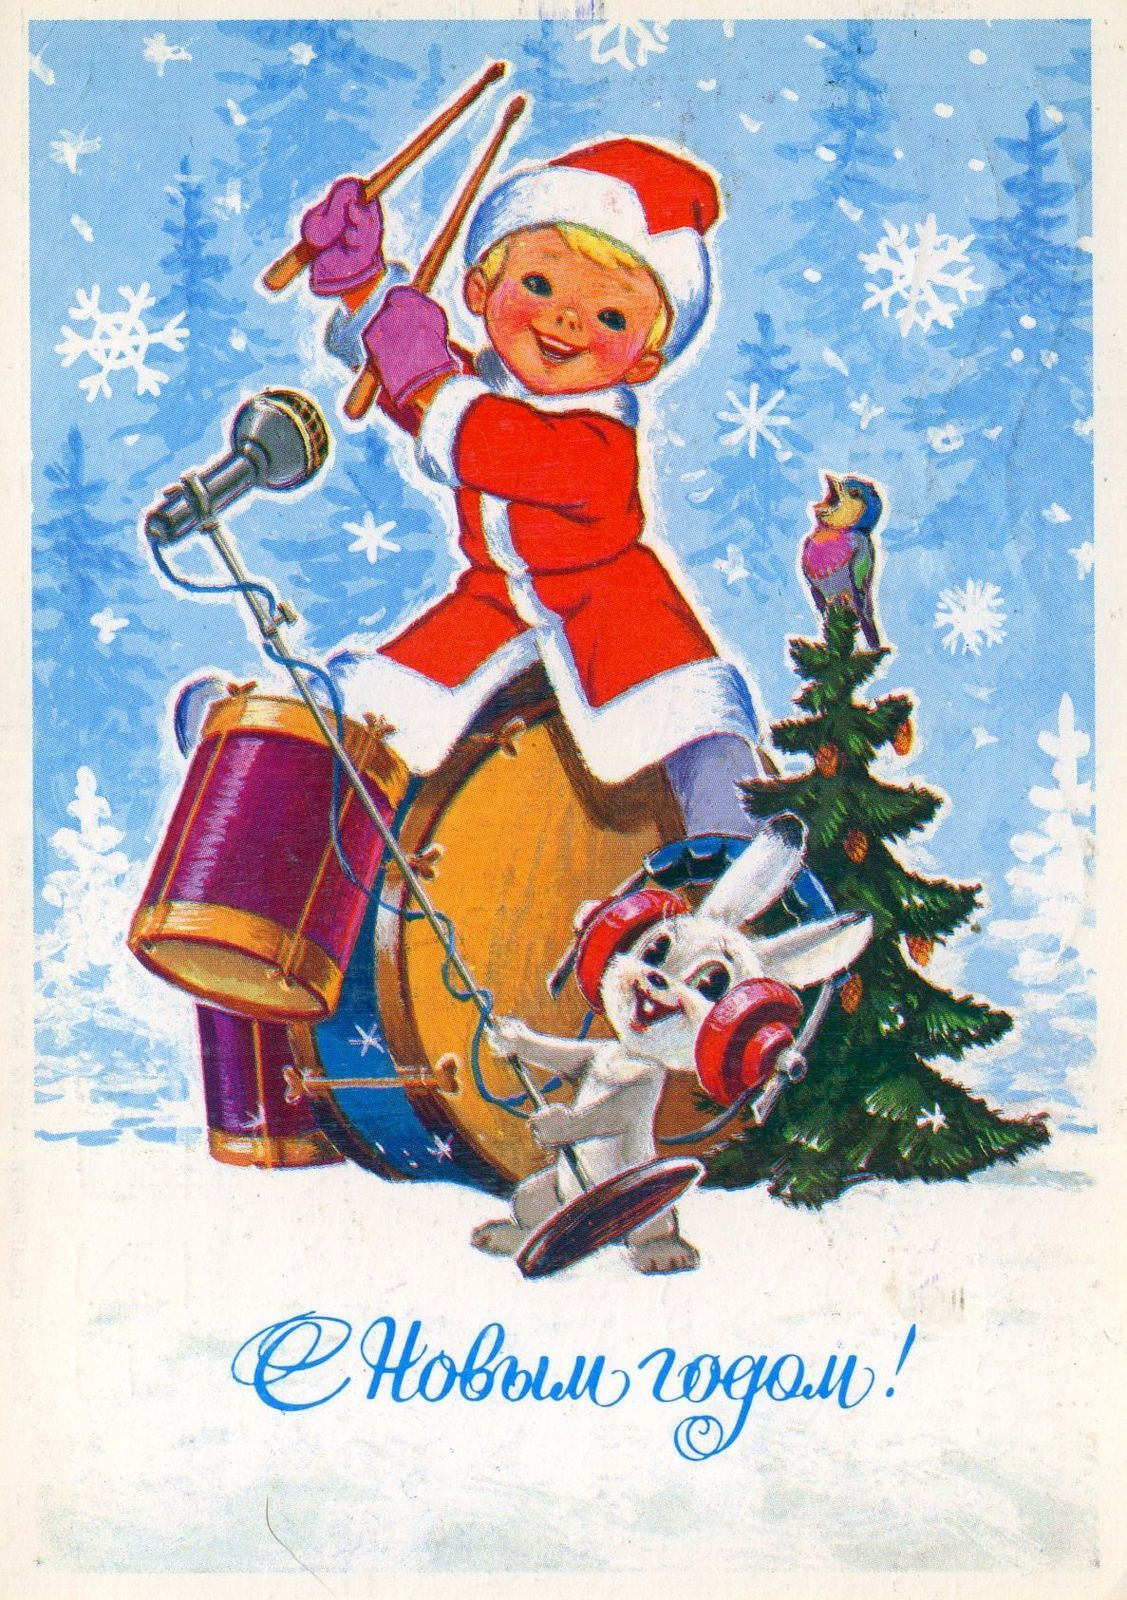 Pin by Noemi Romero on Postales de Navidad | Pinterest | Drummer boy ...